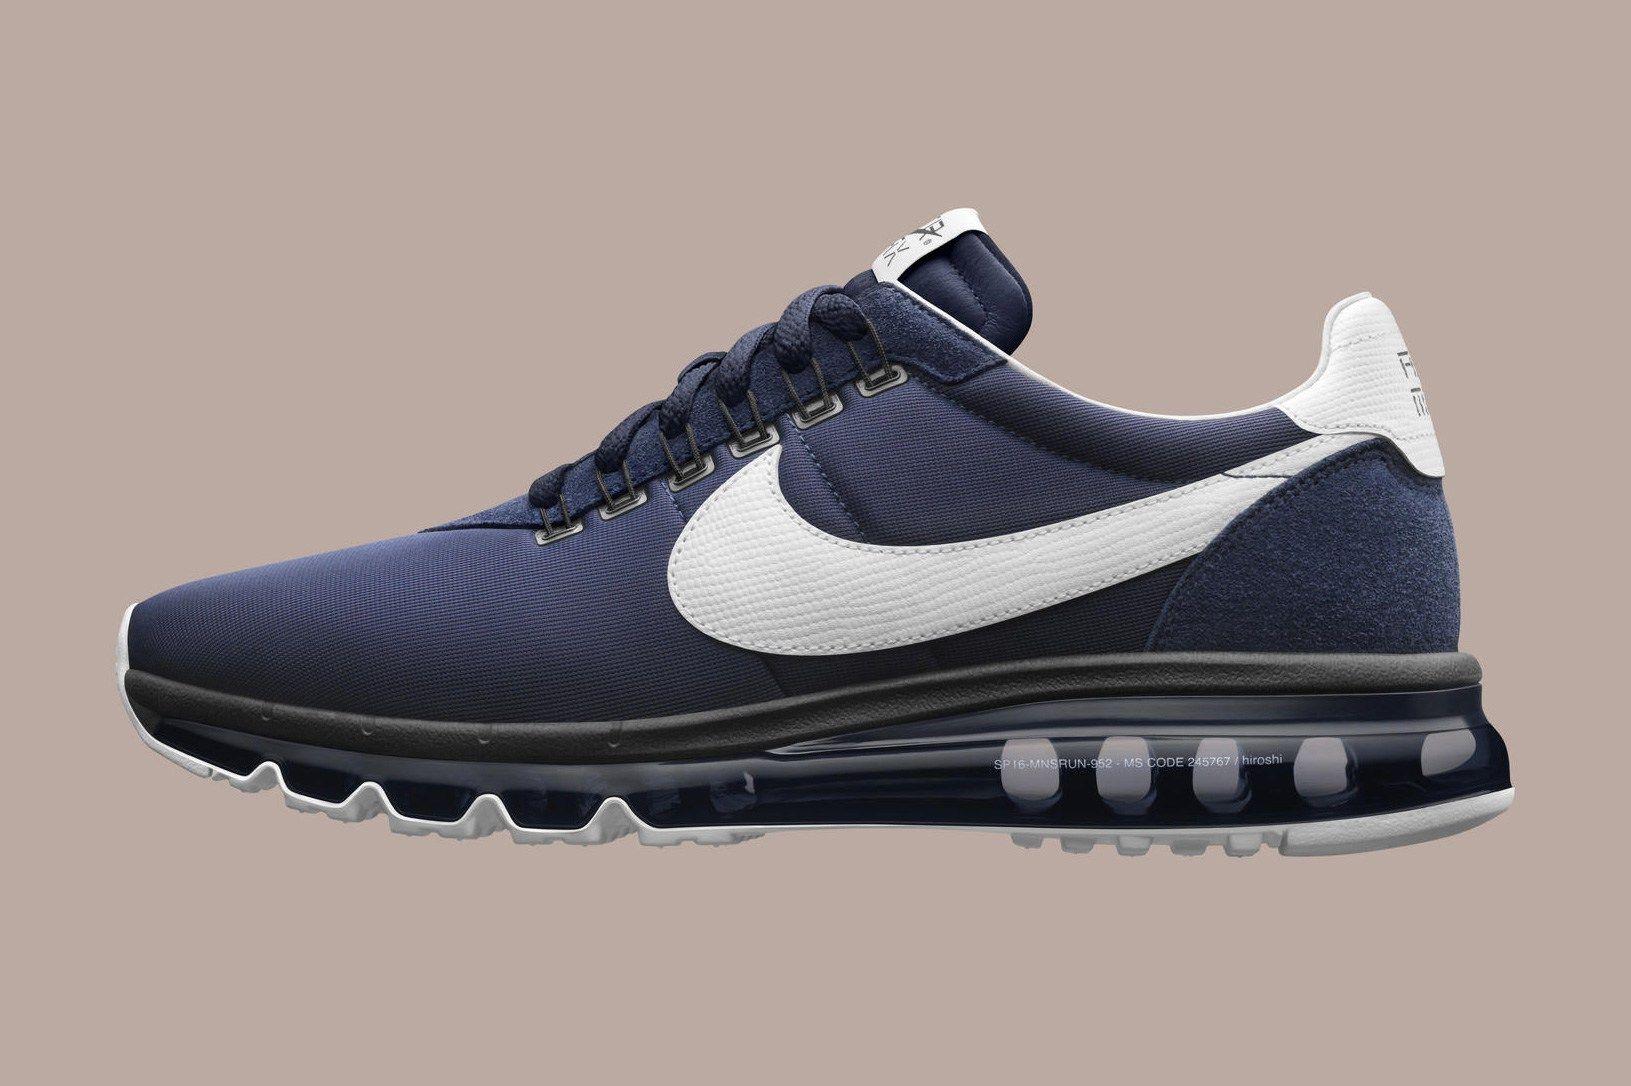 Nike Ltd Zéro Air Max H Réductions De Footlocker